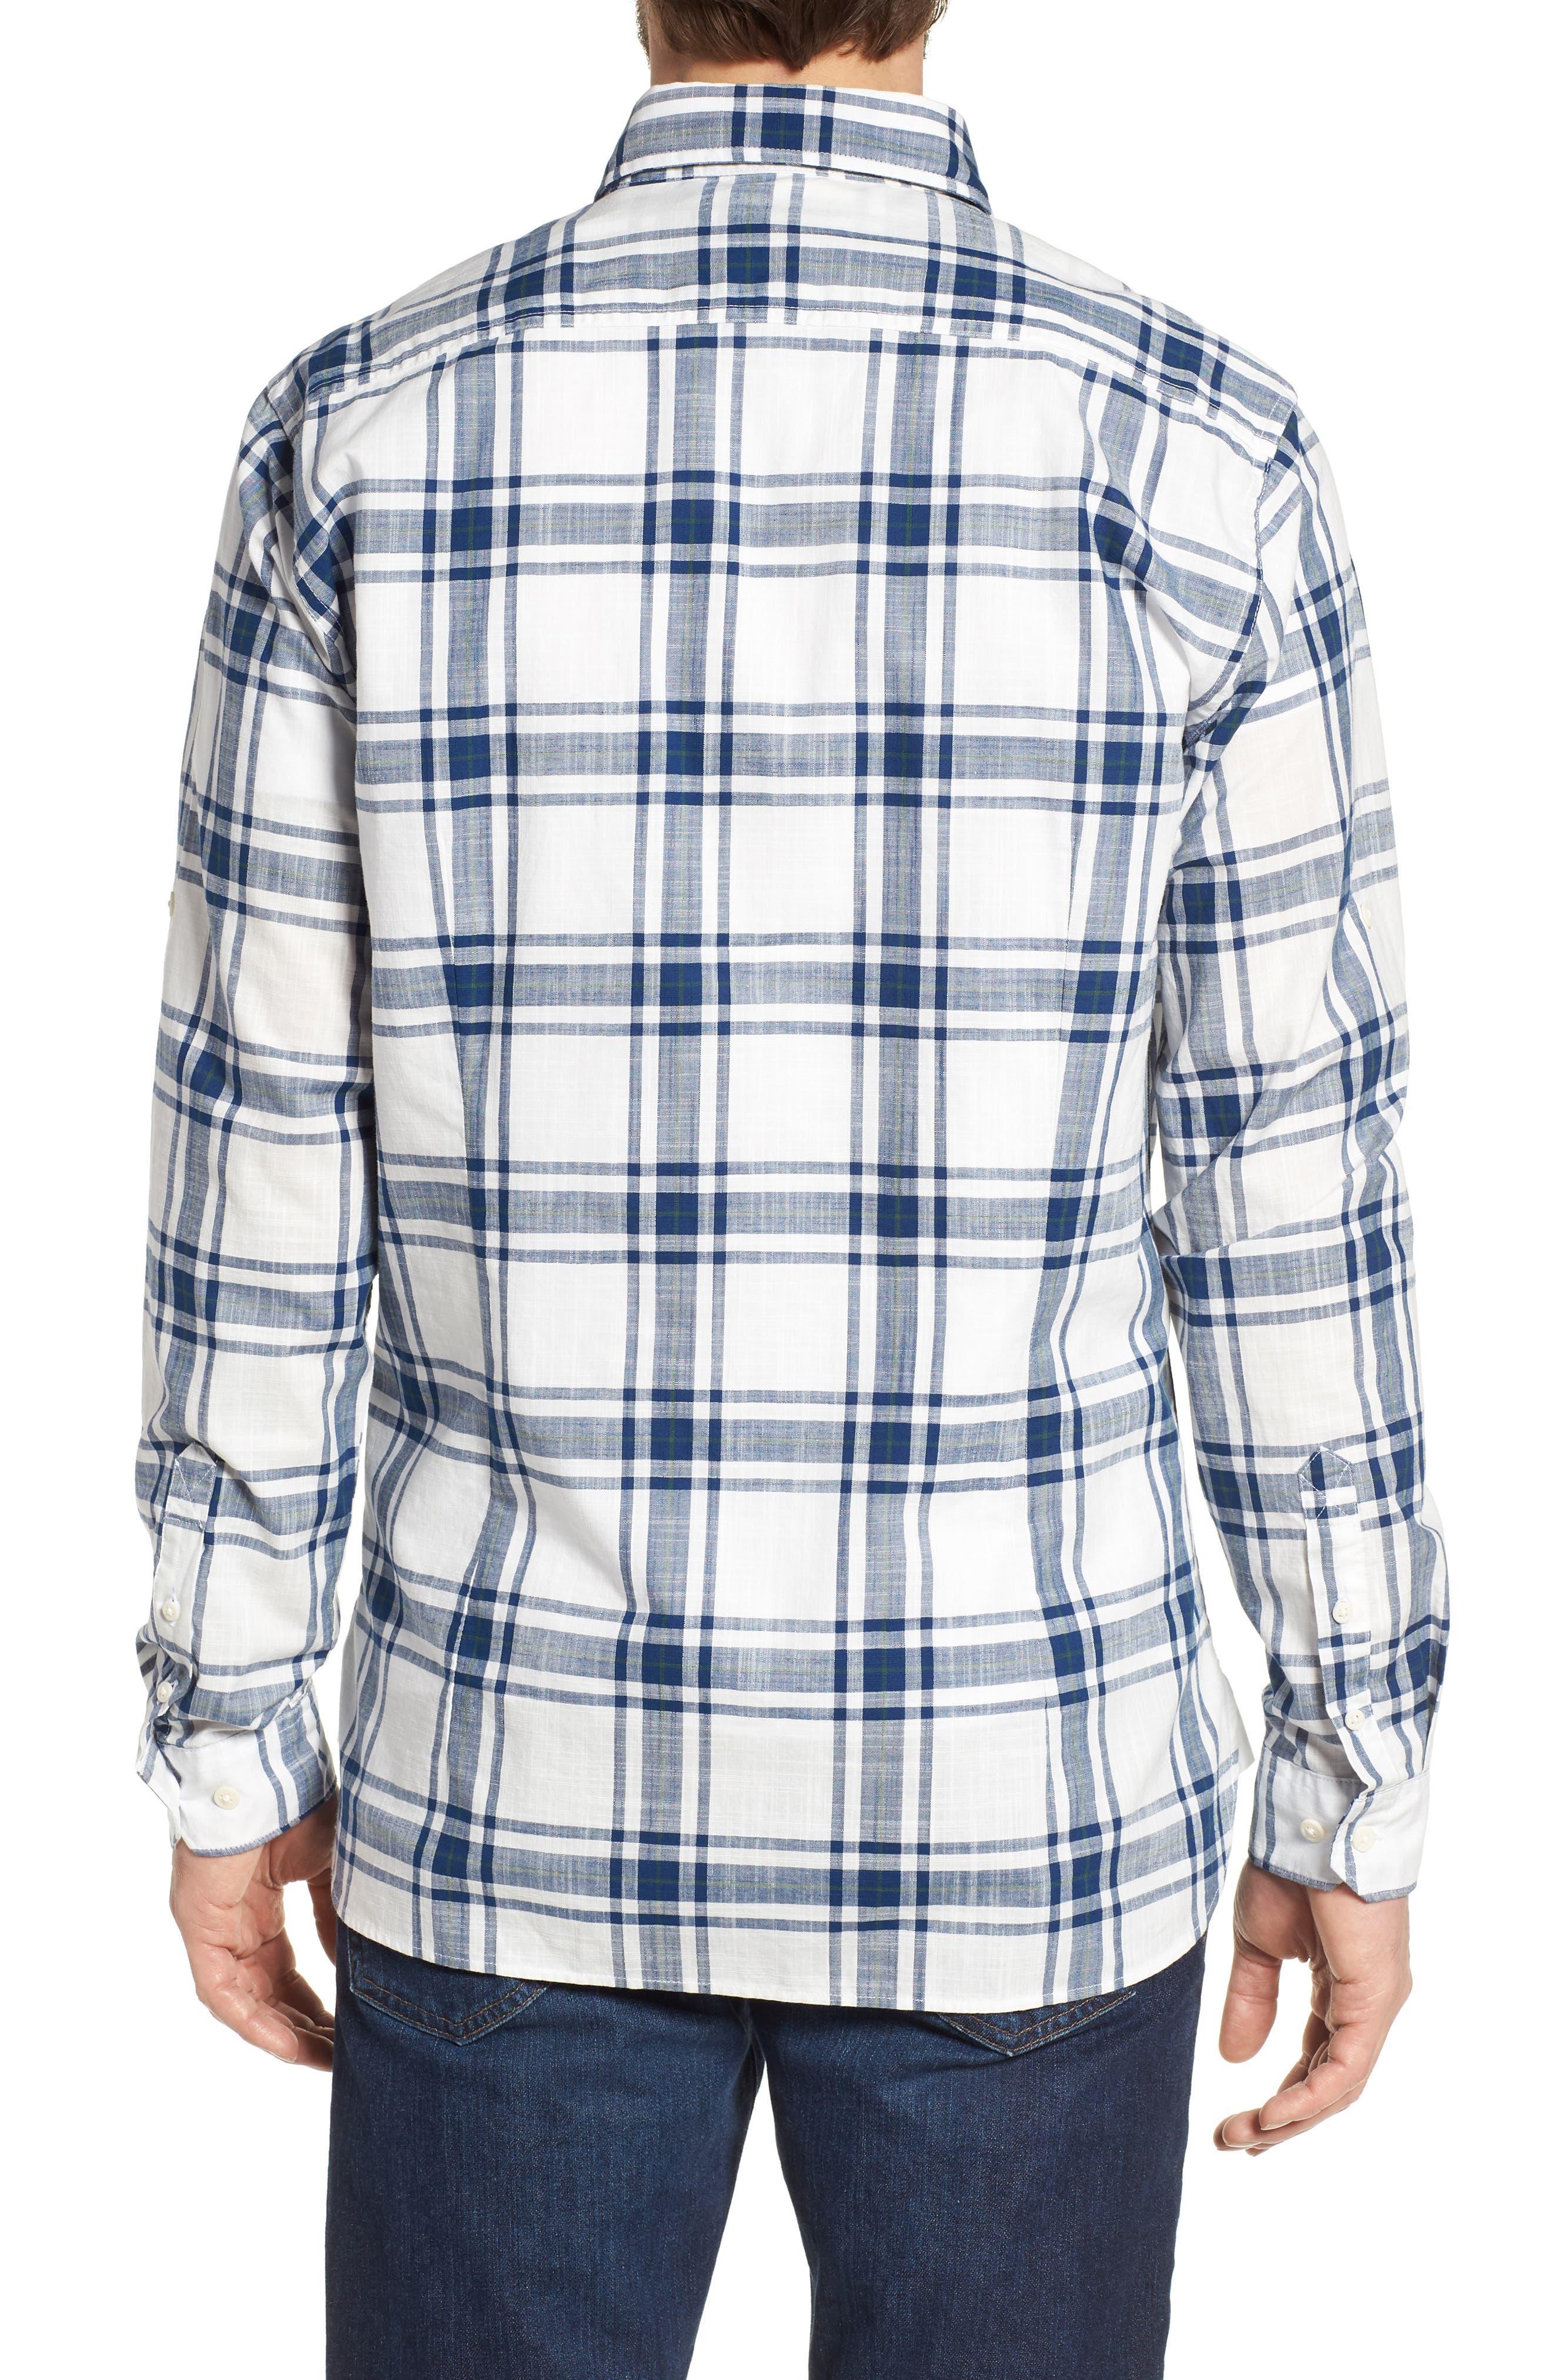 Elver Tailored Fit Plaid Sport Shirt,                             Alternate thumbnail 2, color,                             330